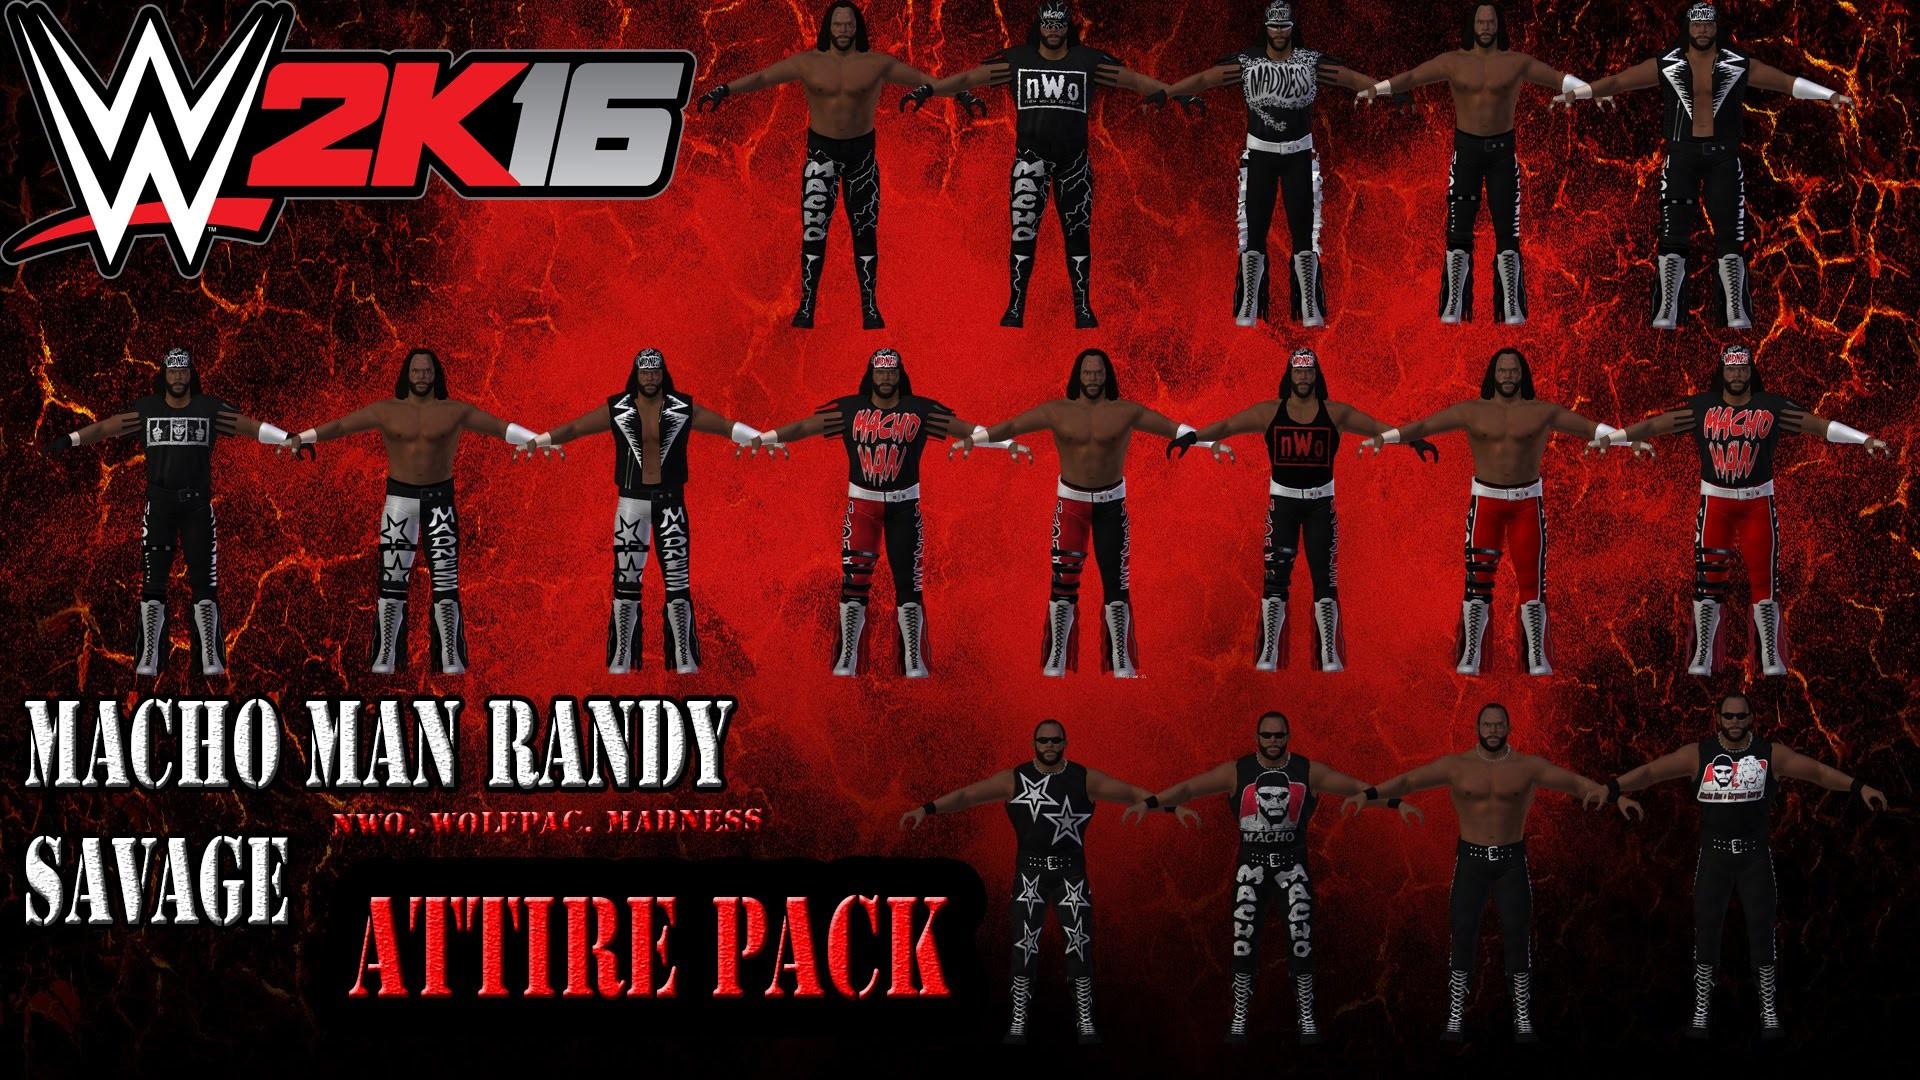 WWE 2K16 MODS: Macho Man Randy Savage – 15+ Attire Pack (WCW, NWO, Wolfpac)  – YouTube